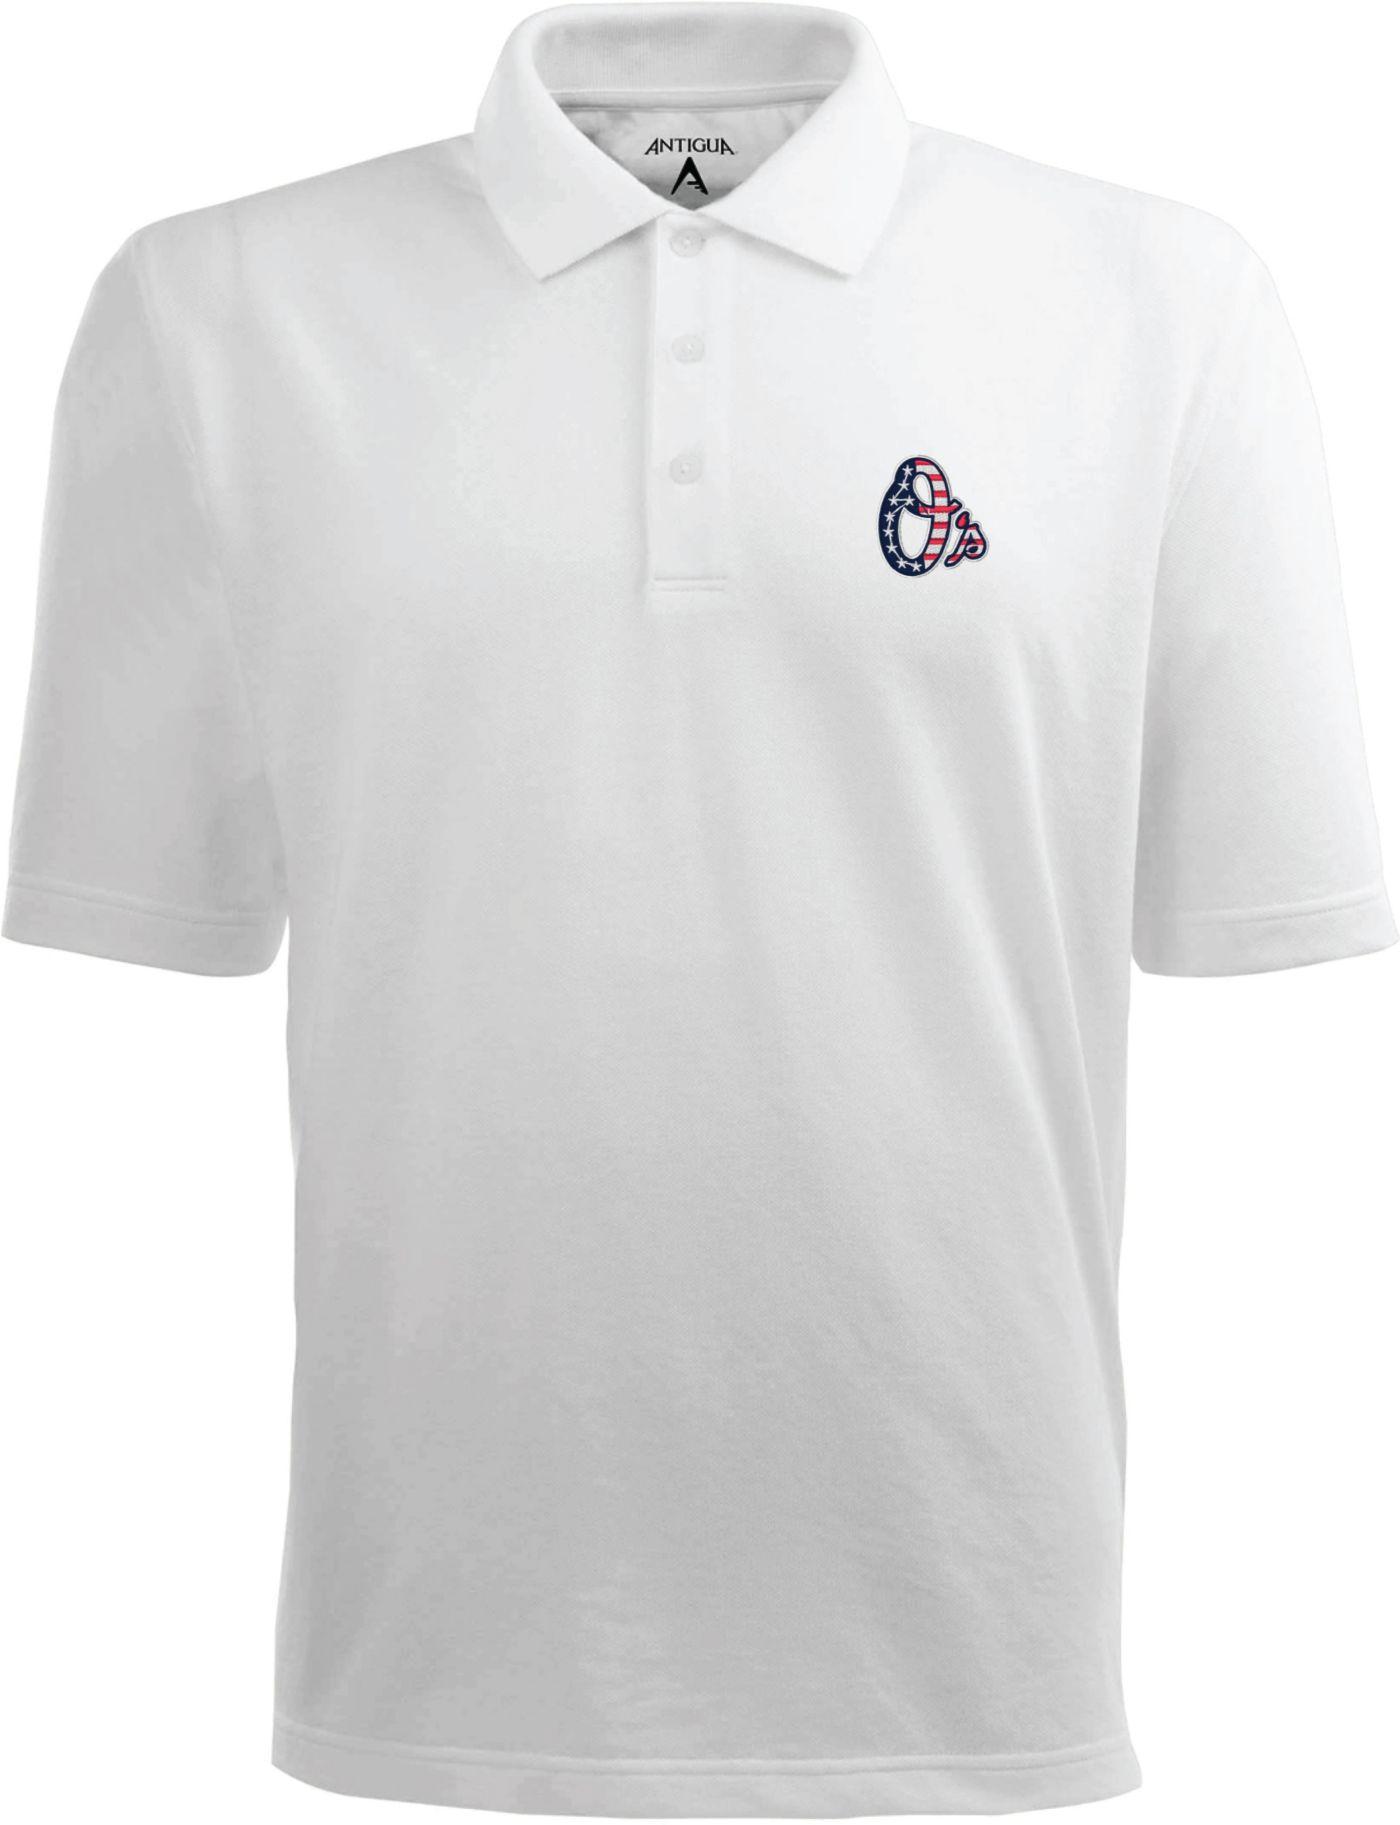 Antigua Men's Baltimore Orioles Xtra-Lite Patriotic Logo White Pique Performance Polo